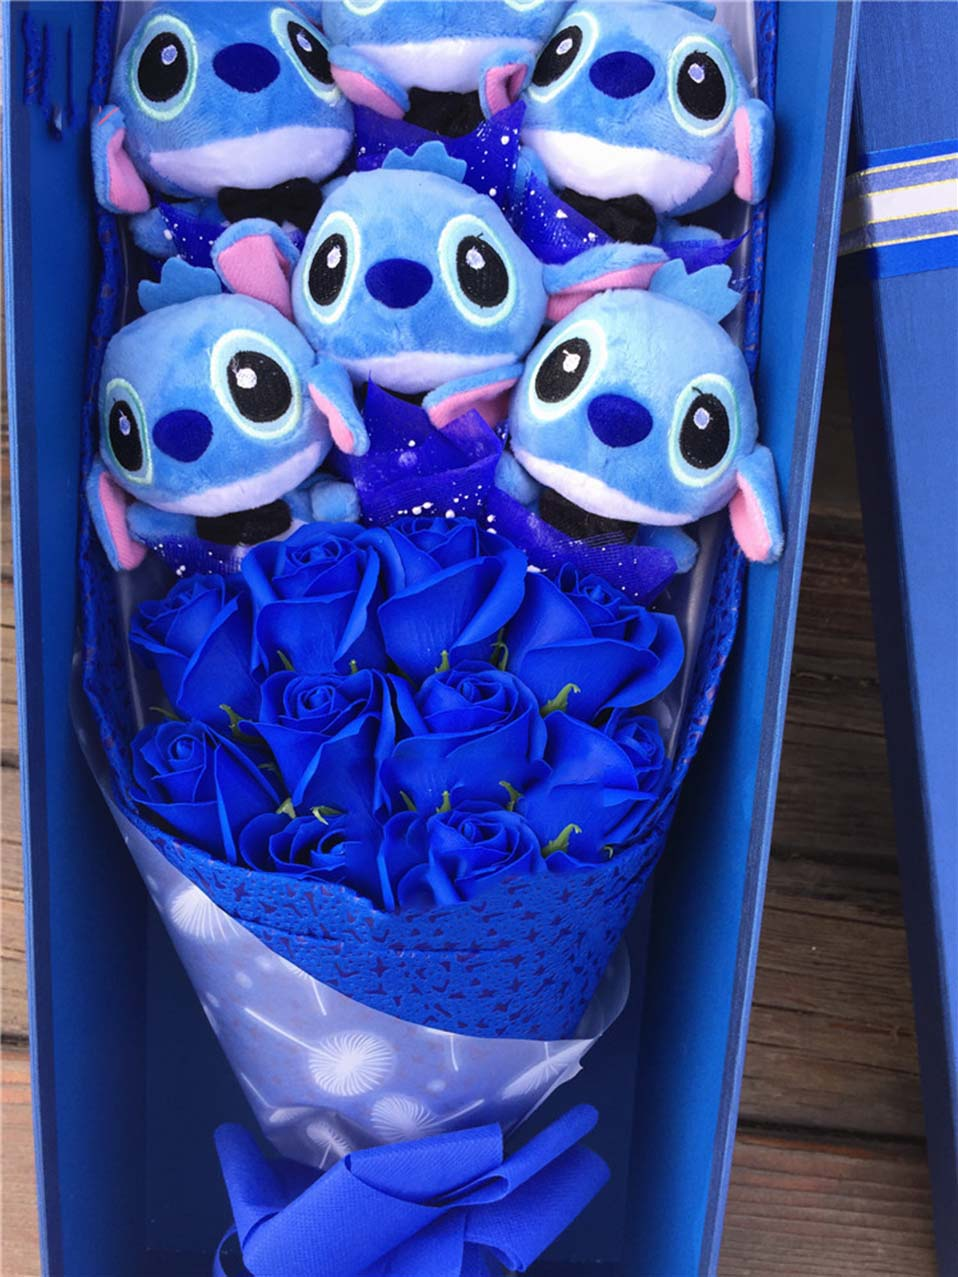 kawaii Stuffed Toys soft stitch bouquet plush stuffed animals toys gifts Artificial Lovely Cartoon Fake Flowers wedding decoration (2)